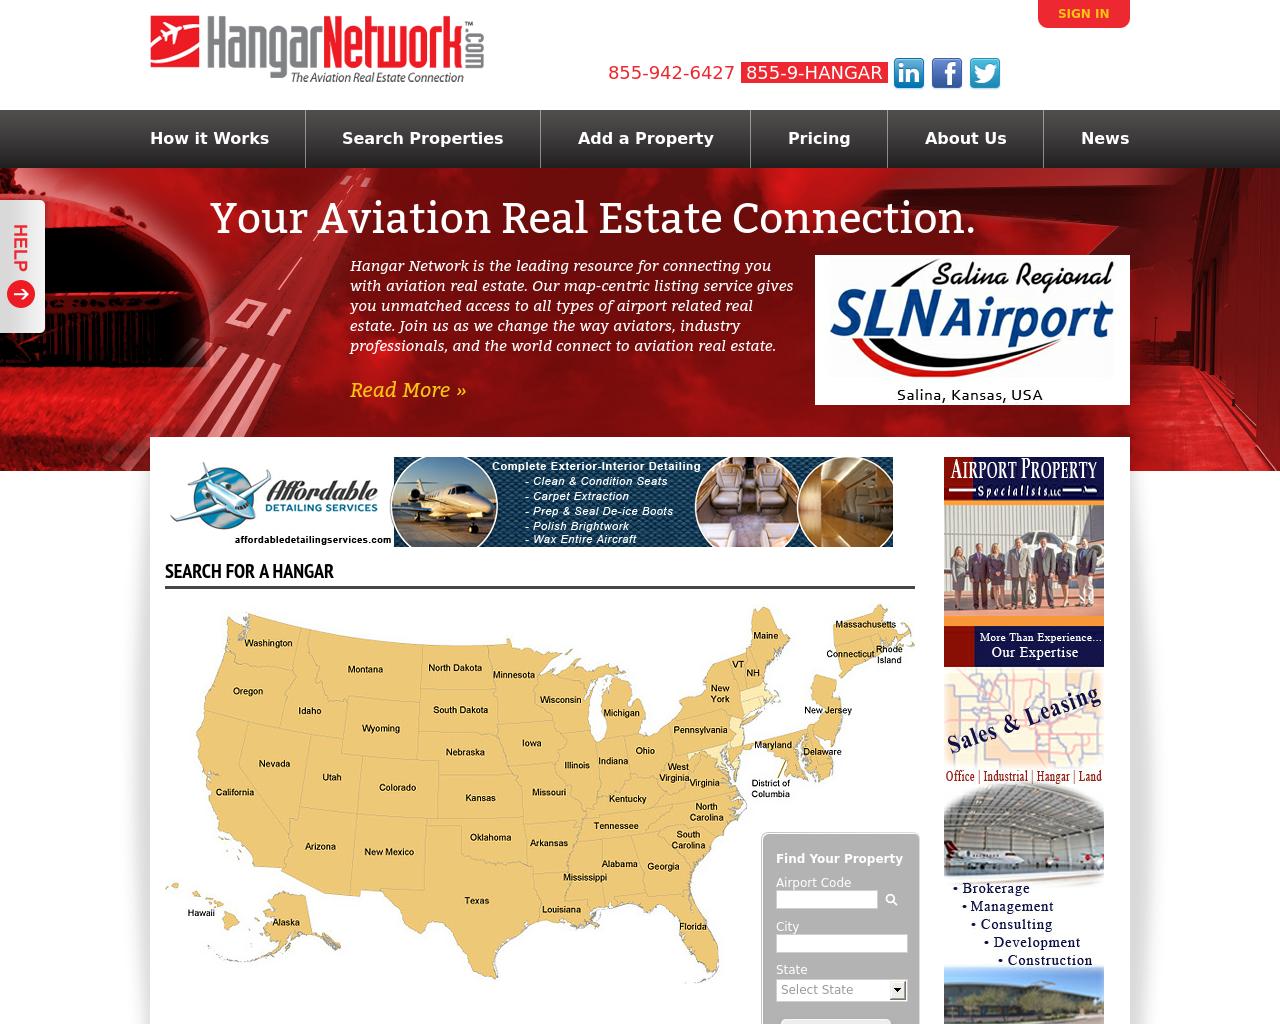 Hangar-Network-Advertising-Reviews-Pricing